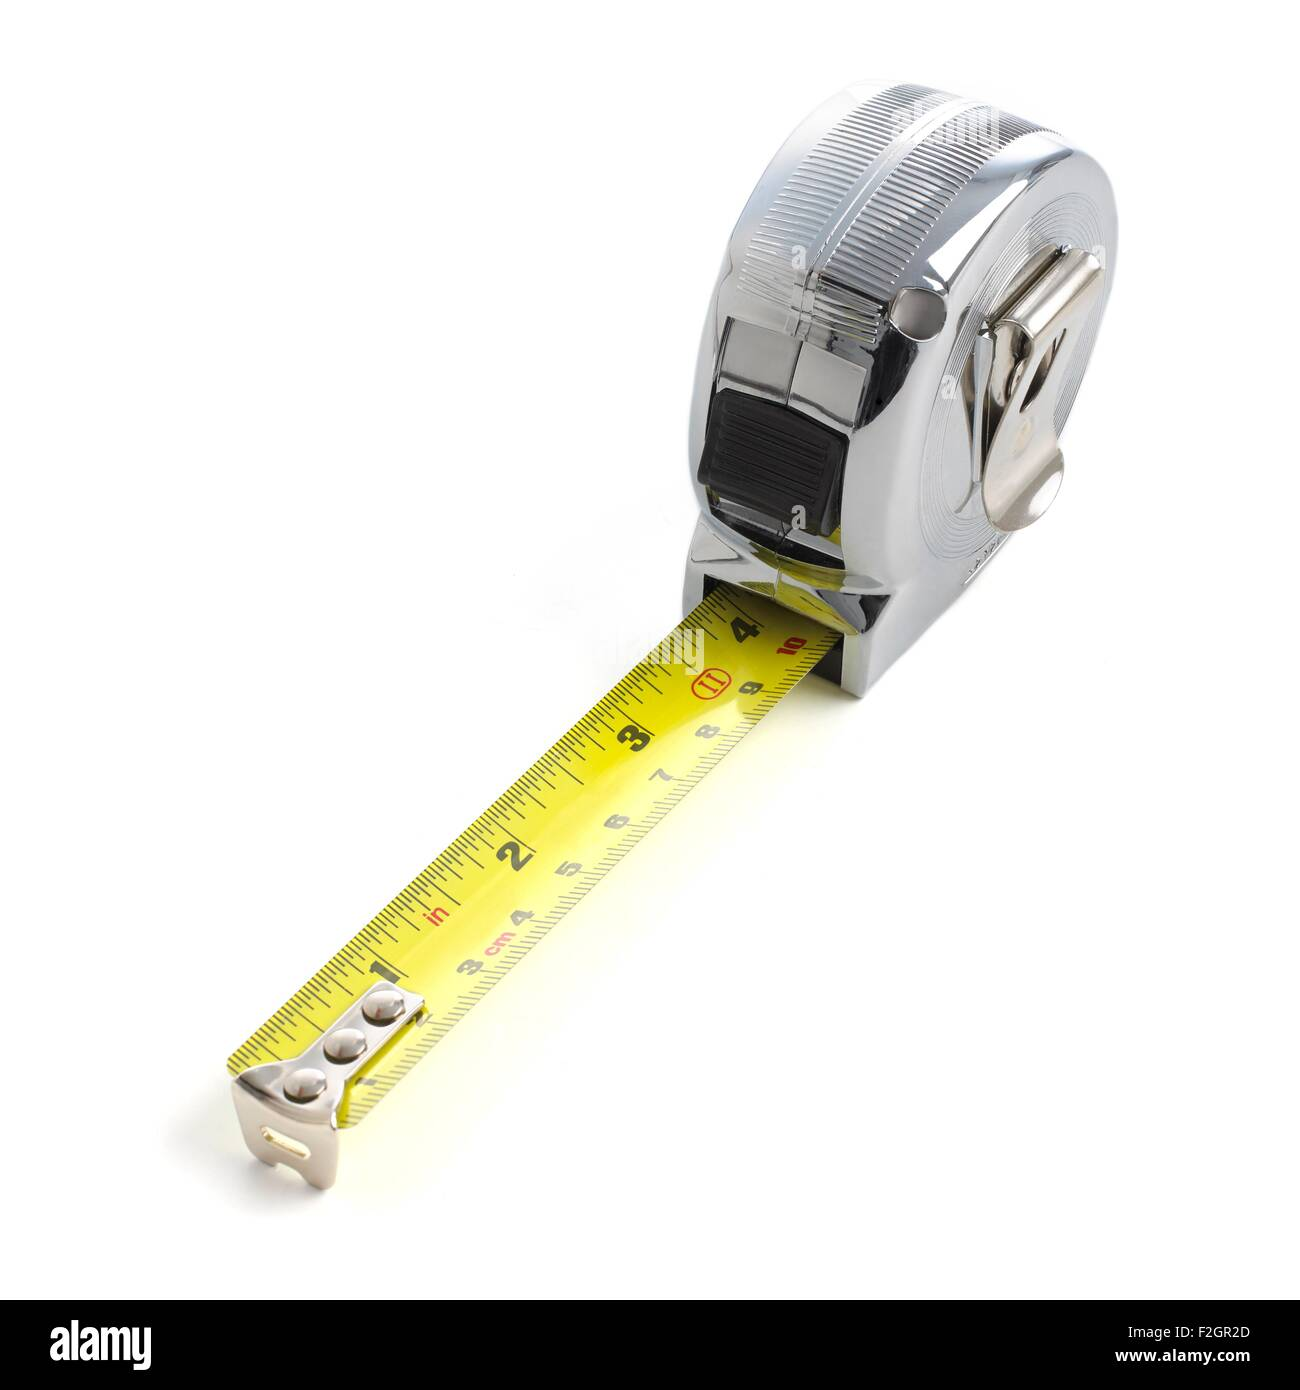 Retractable tape measure - Stock Image